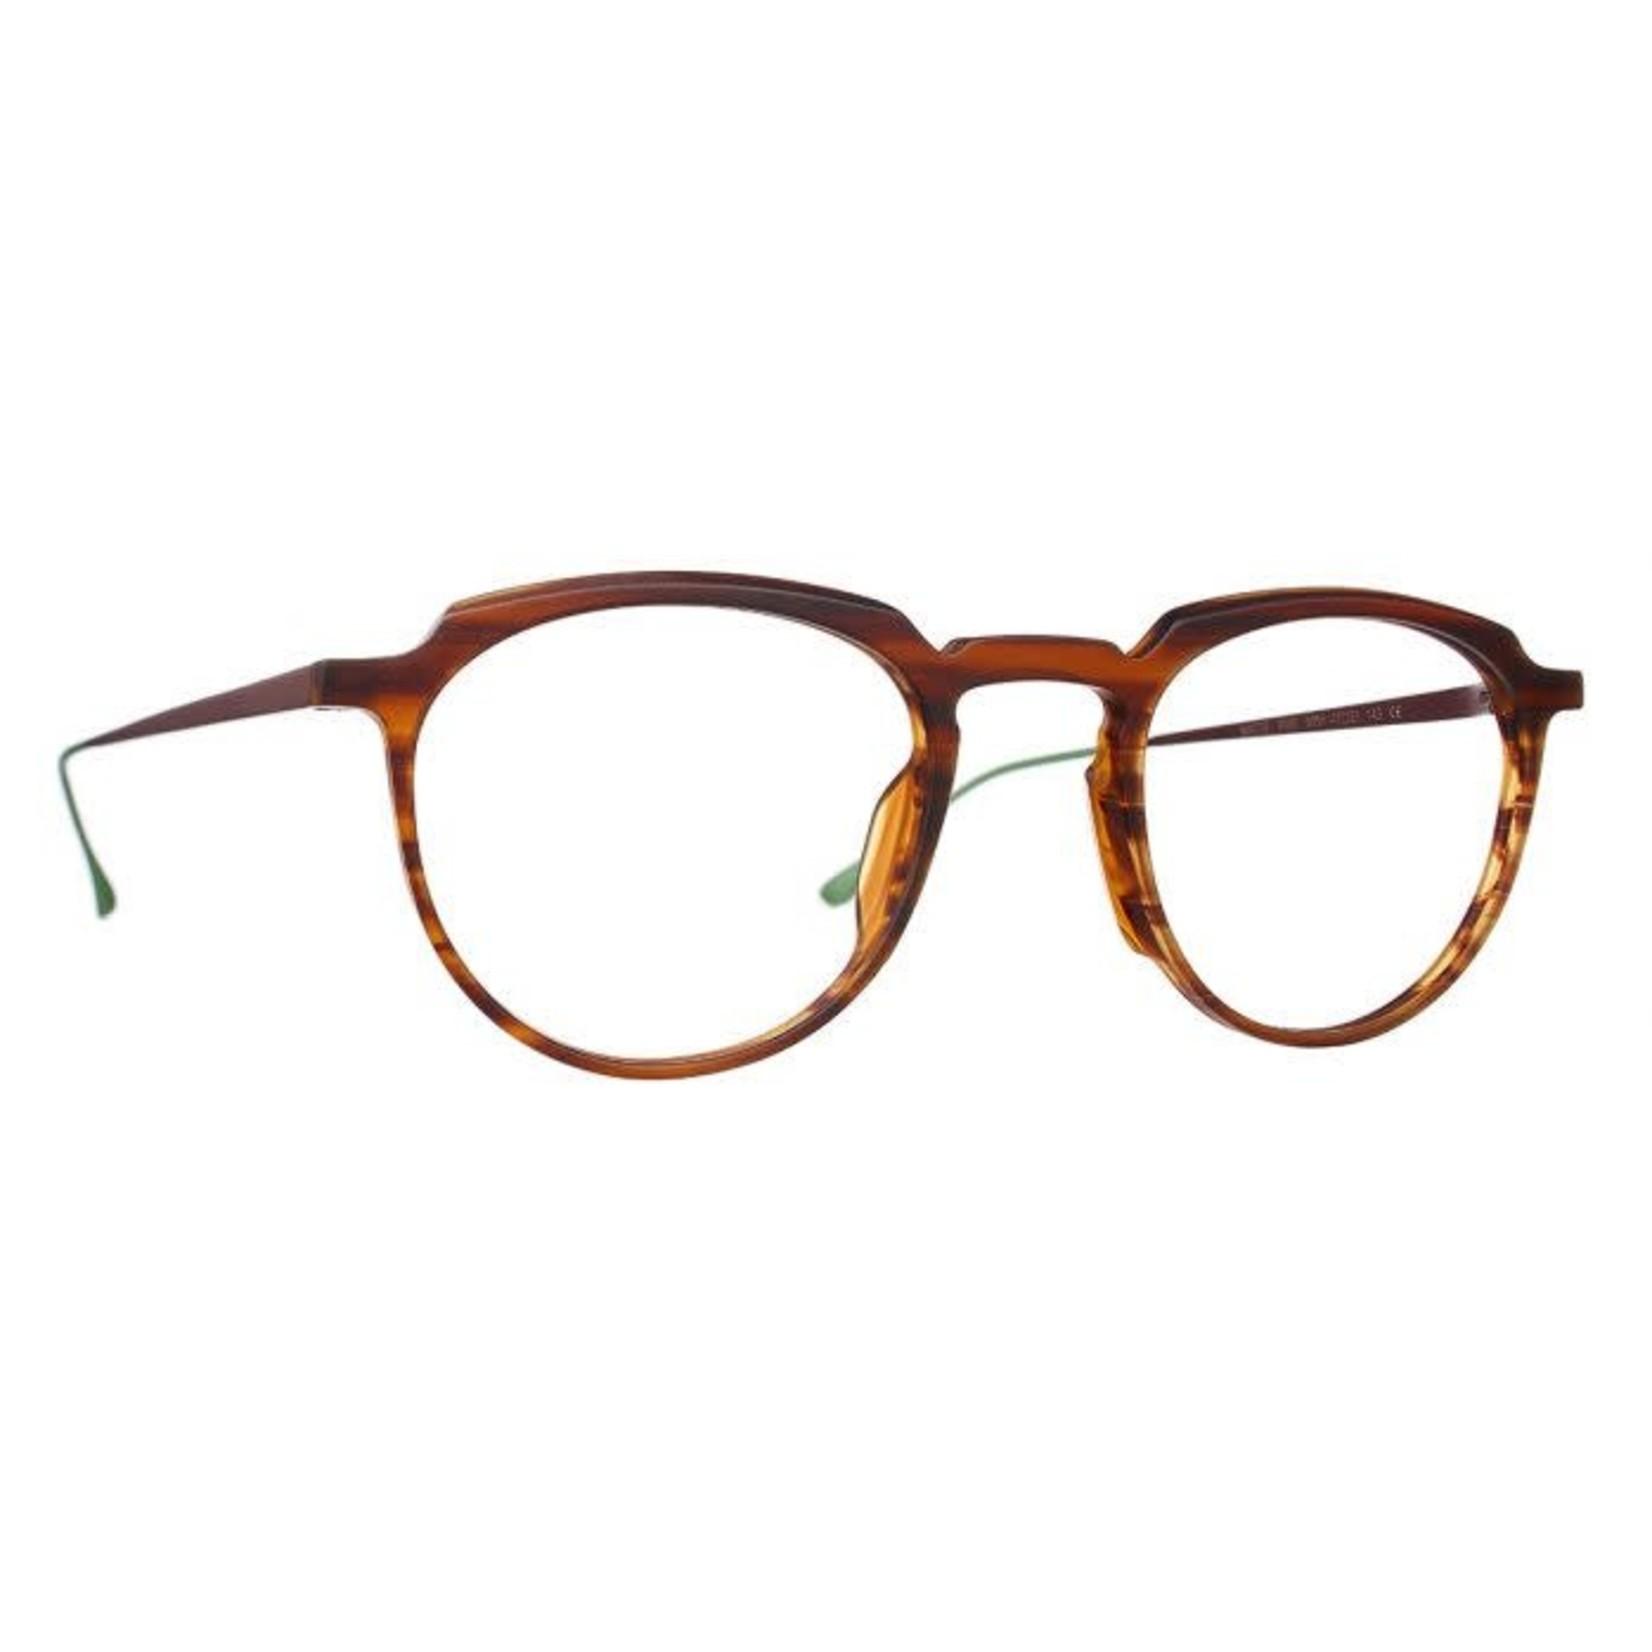 Talla Eyewear Talla Pibe